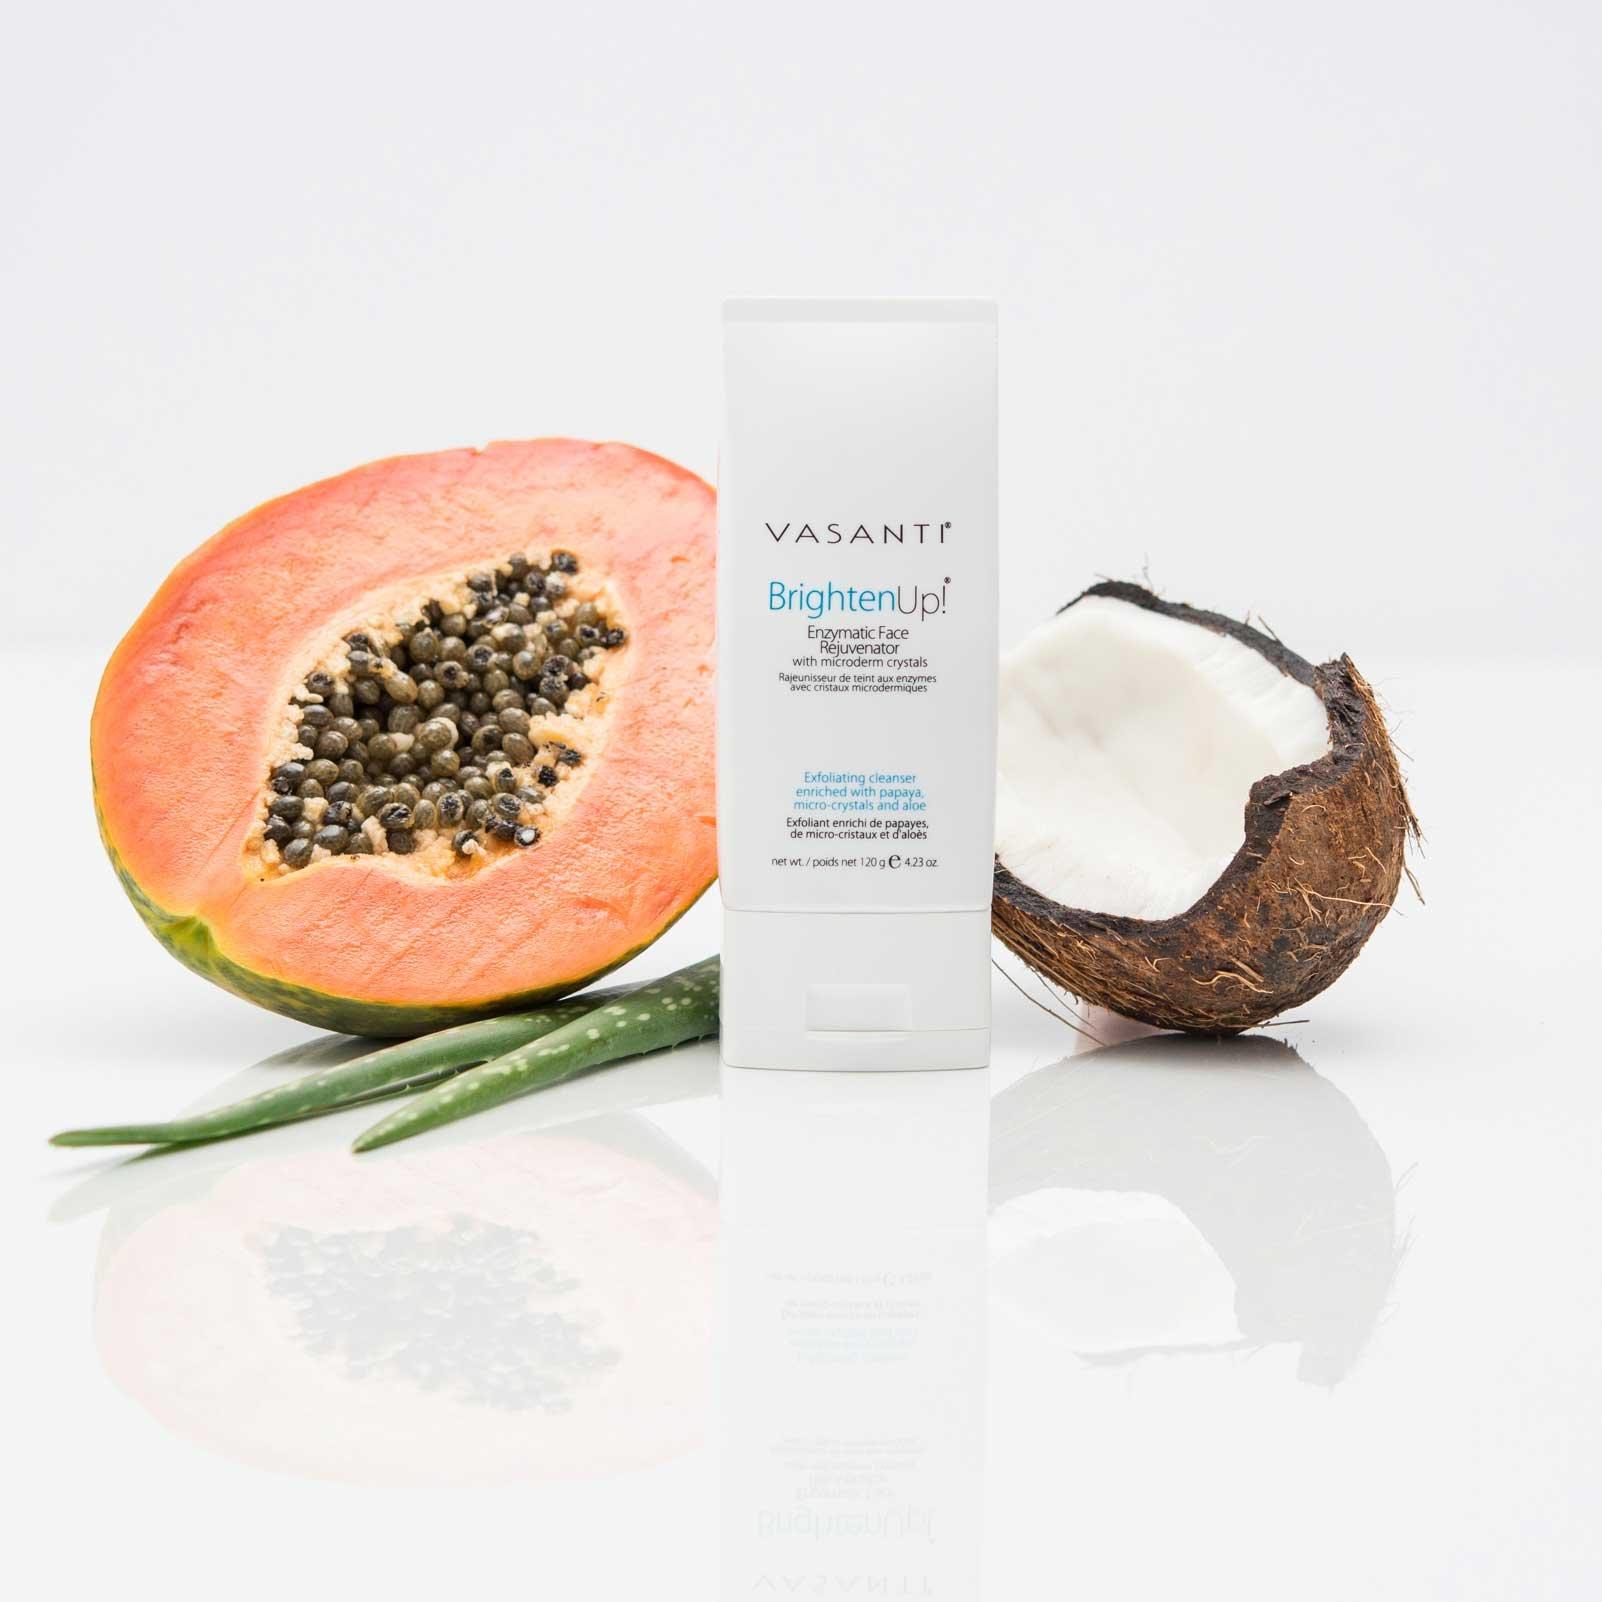 Vasanti Cosmetics Brighten Up! Enzymatic Face Rejuvenator Exfoliating Face Wash by VASANTI - Get Healthy Glowing Skin - Original Size (120g) by Vasanti Cosmetics (Image #4)